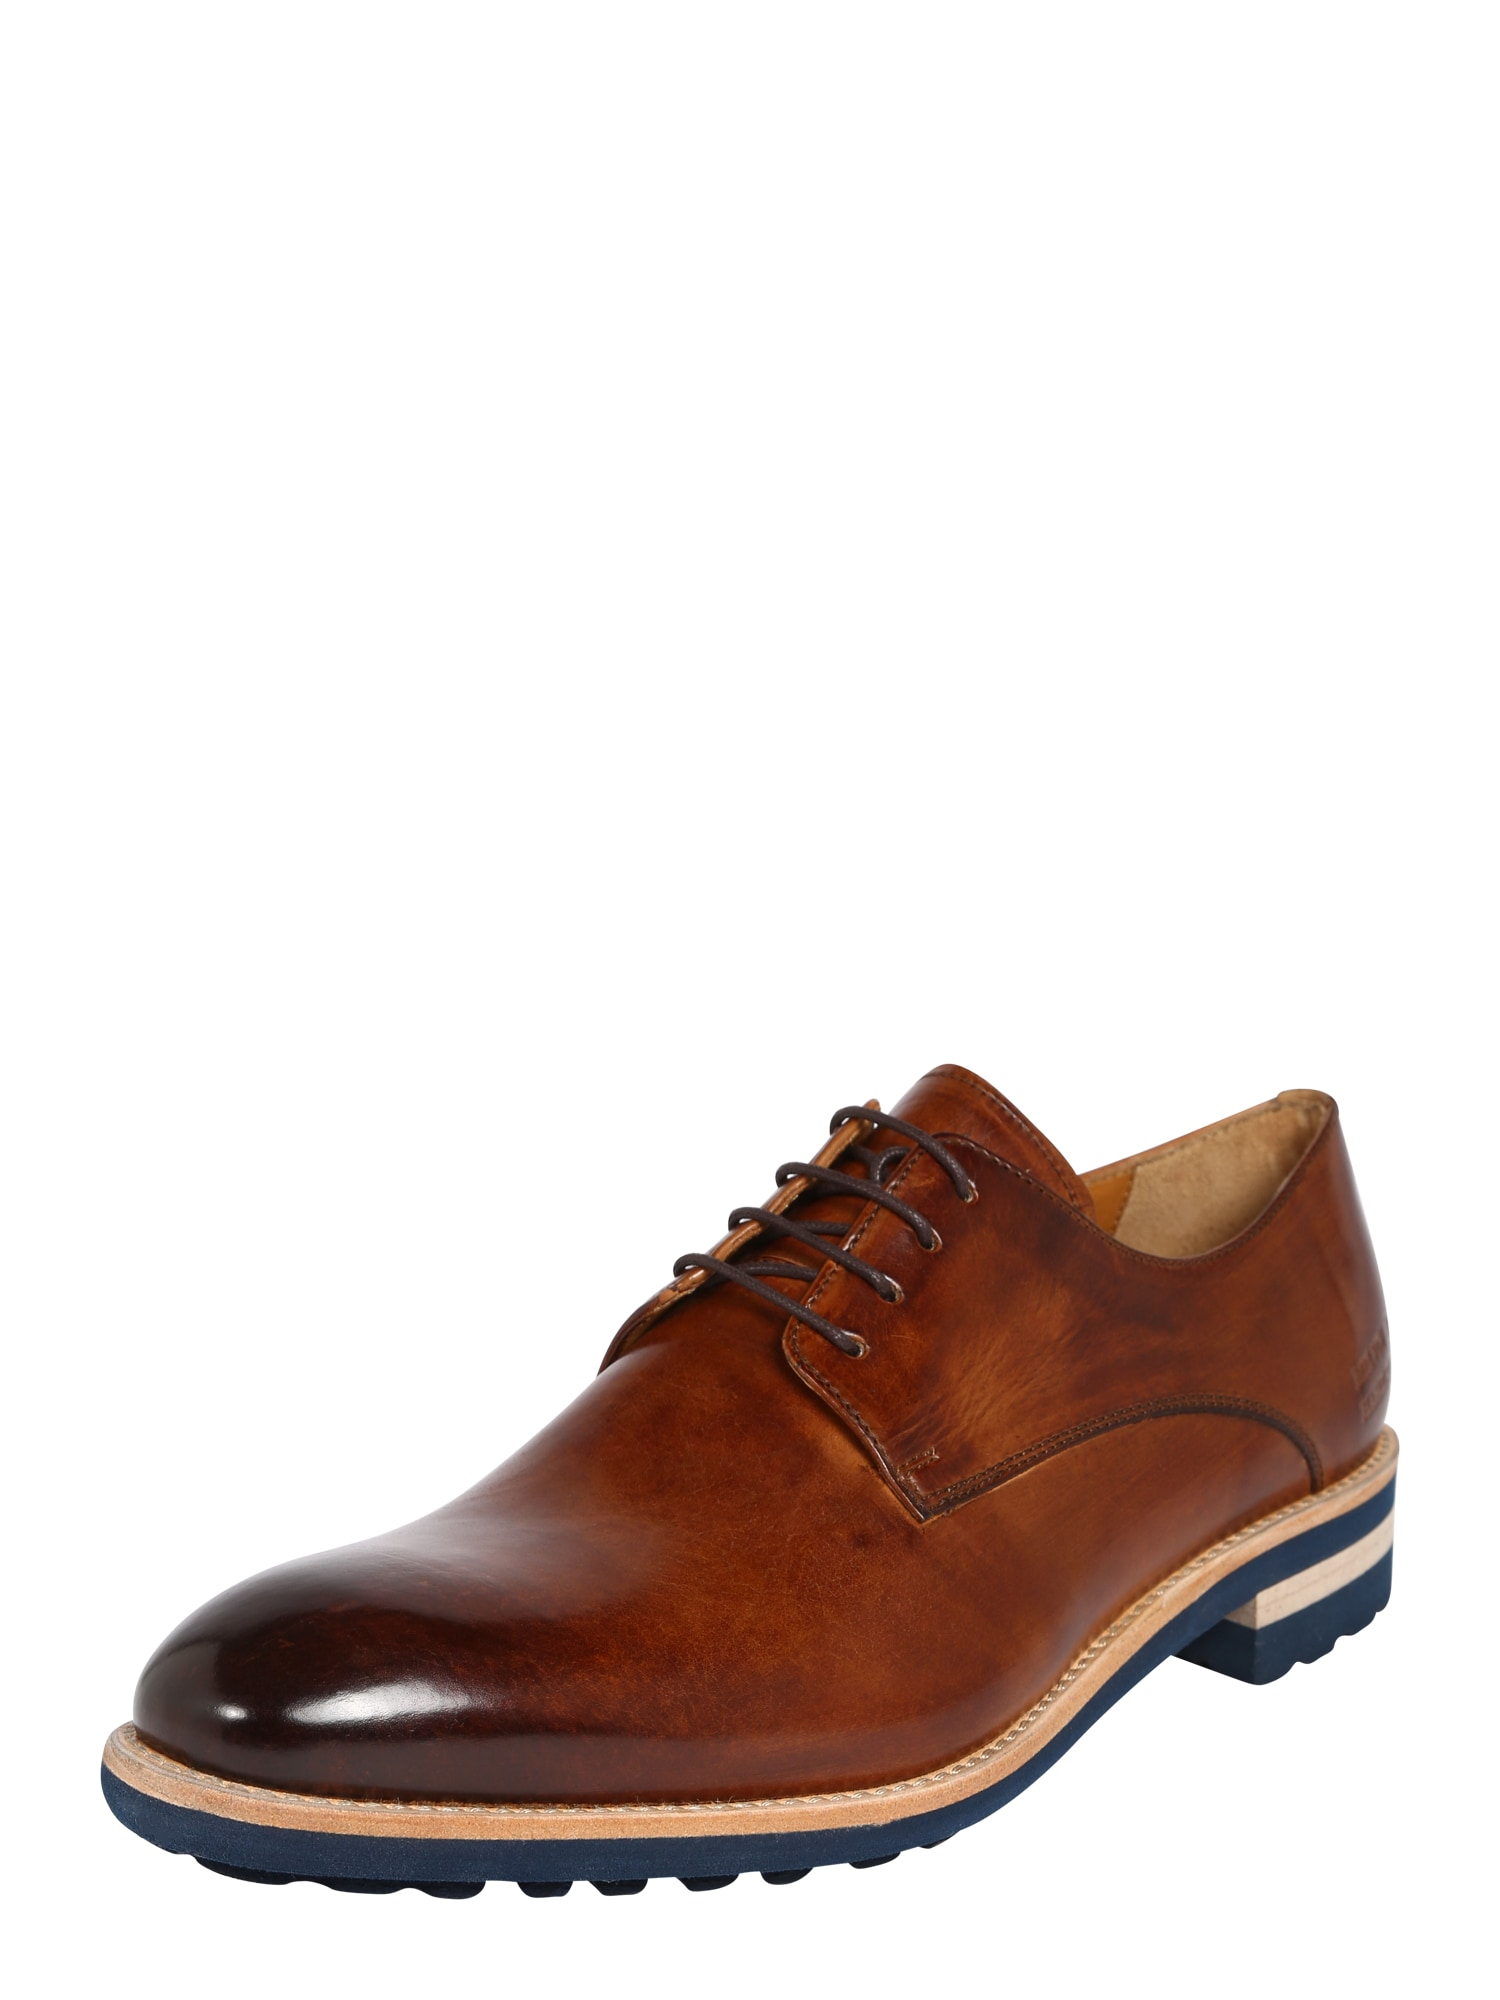 Šněrovací boty Tom 8 hnědá MELVIN & HAMILTON